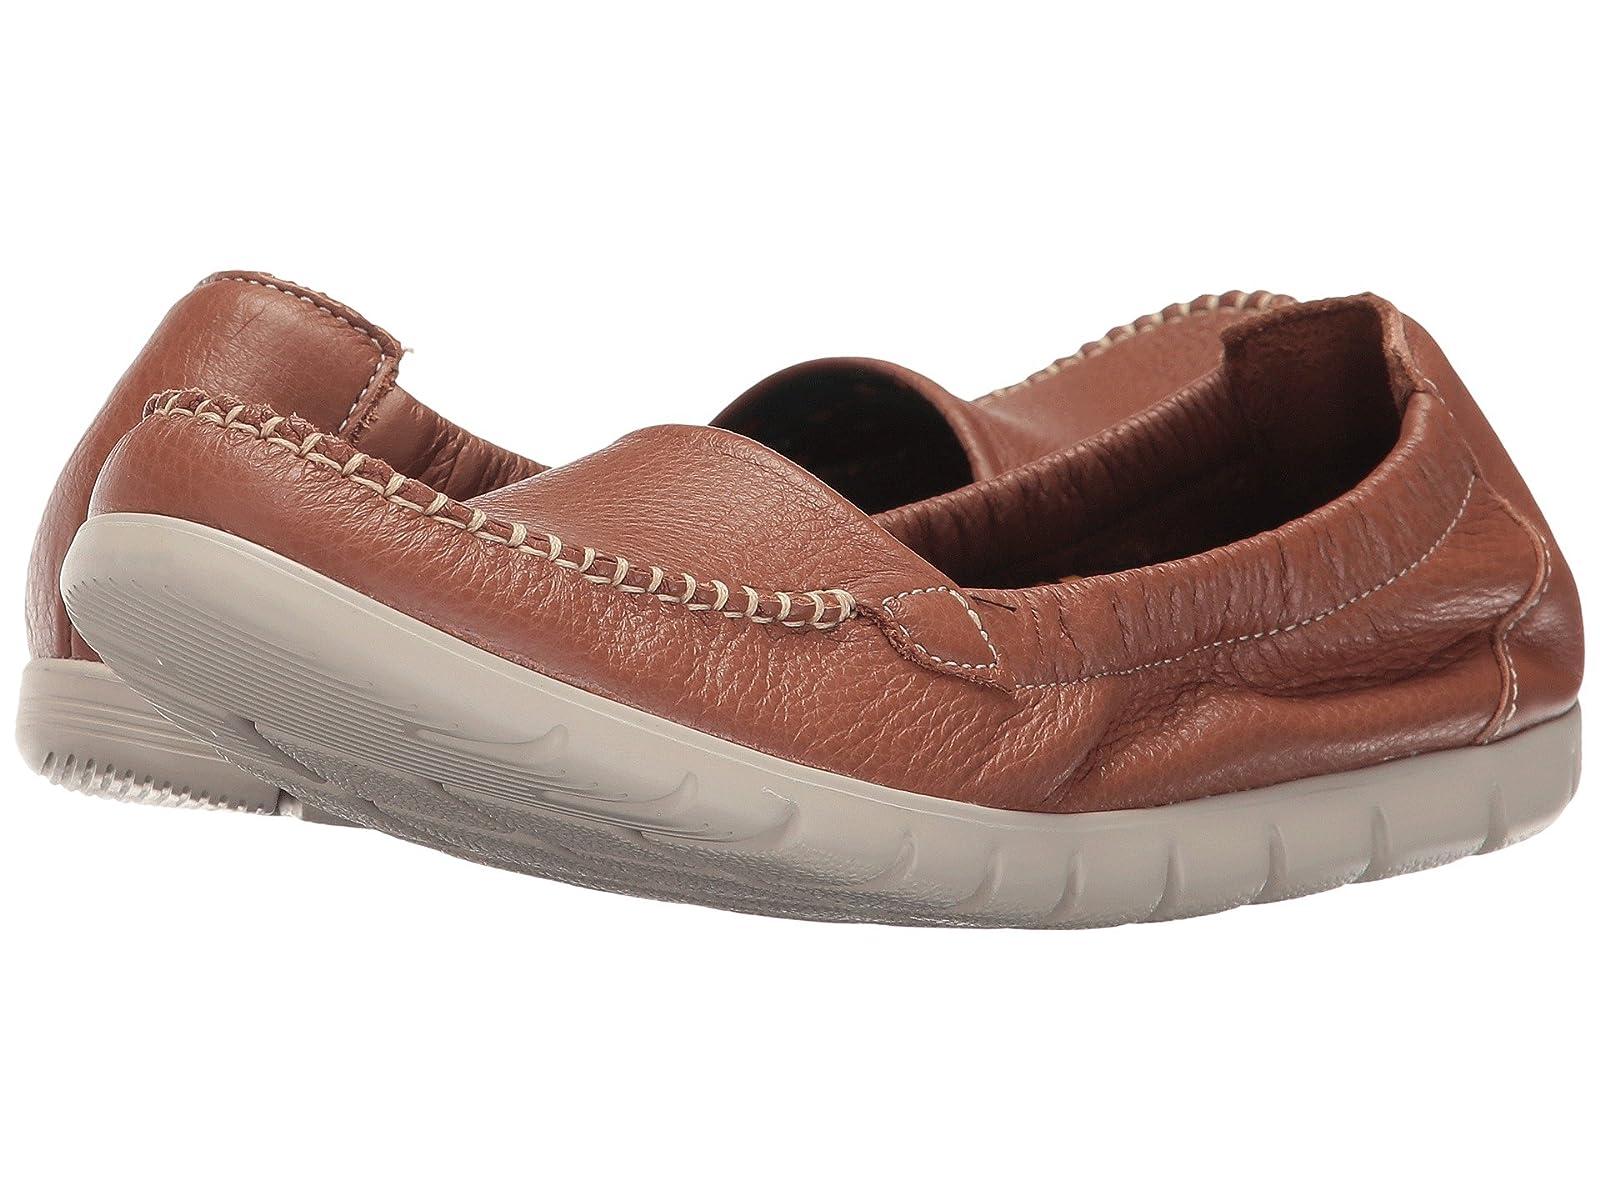 SAS SunnyAtmospheric grades have affordable shoes